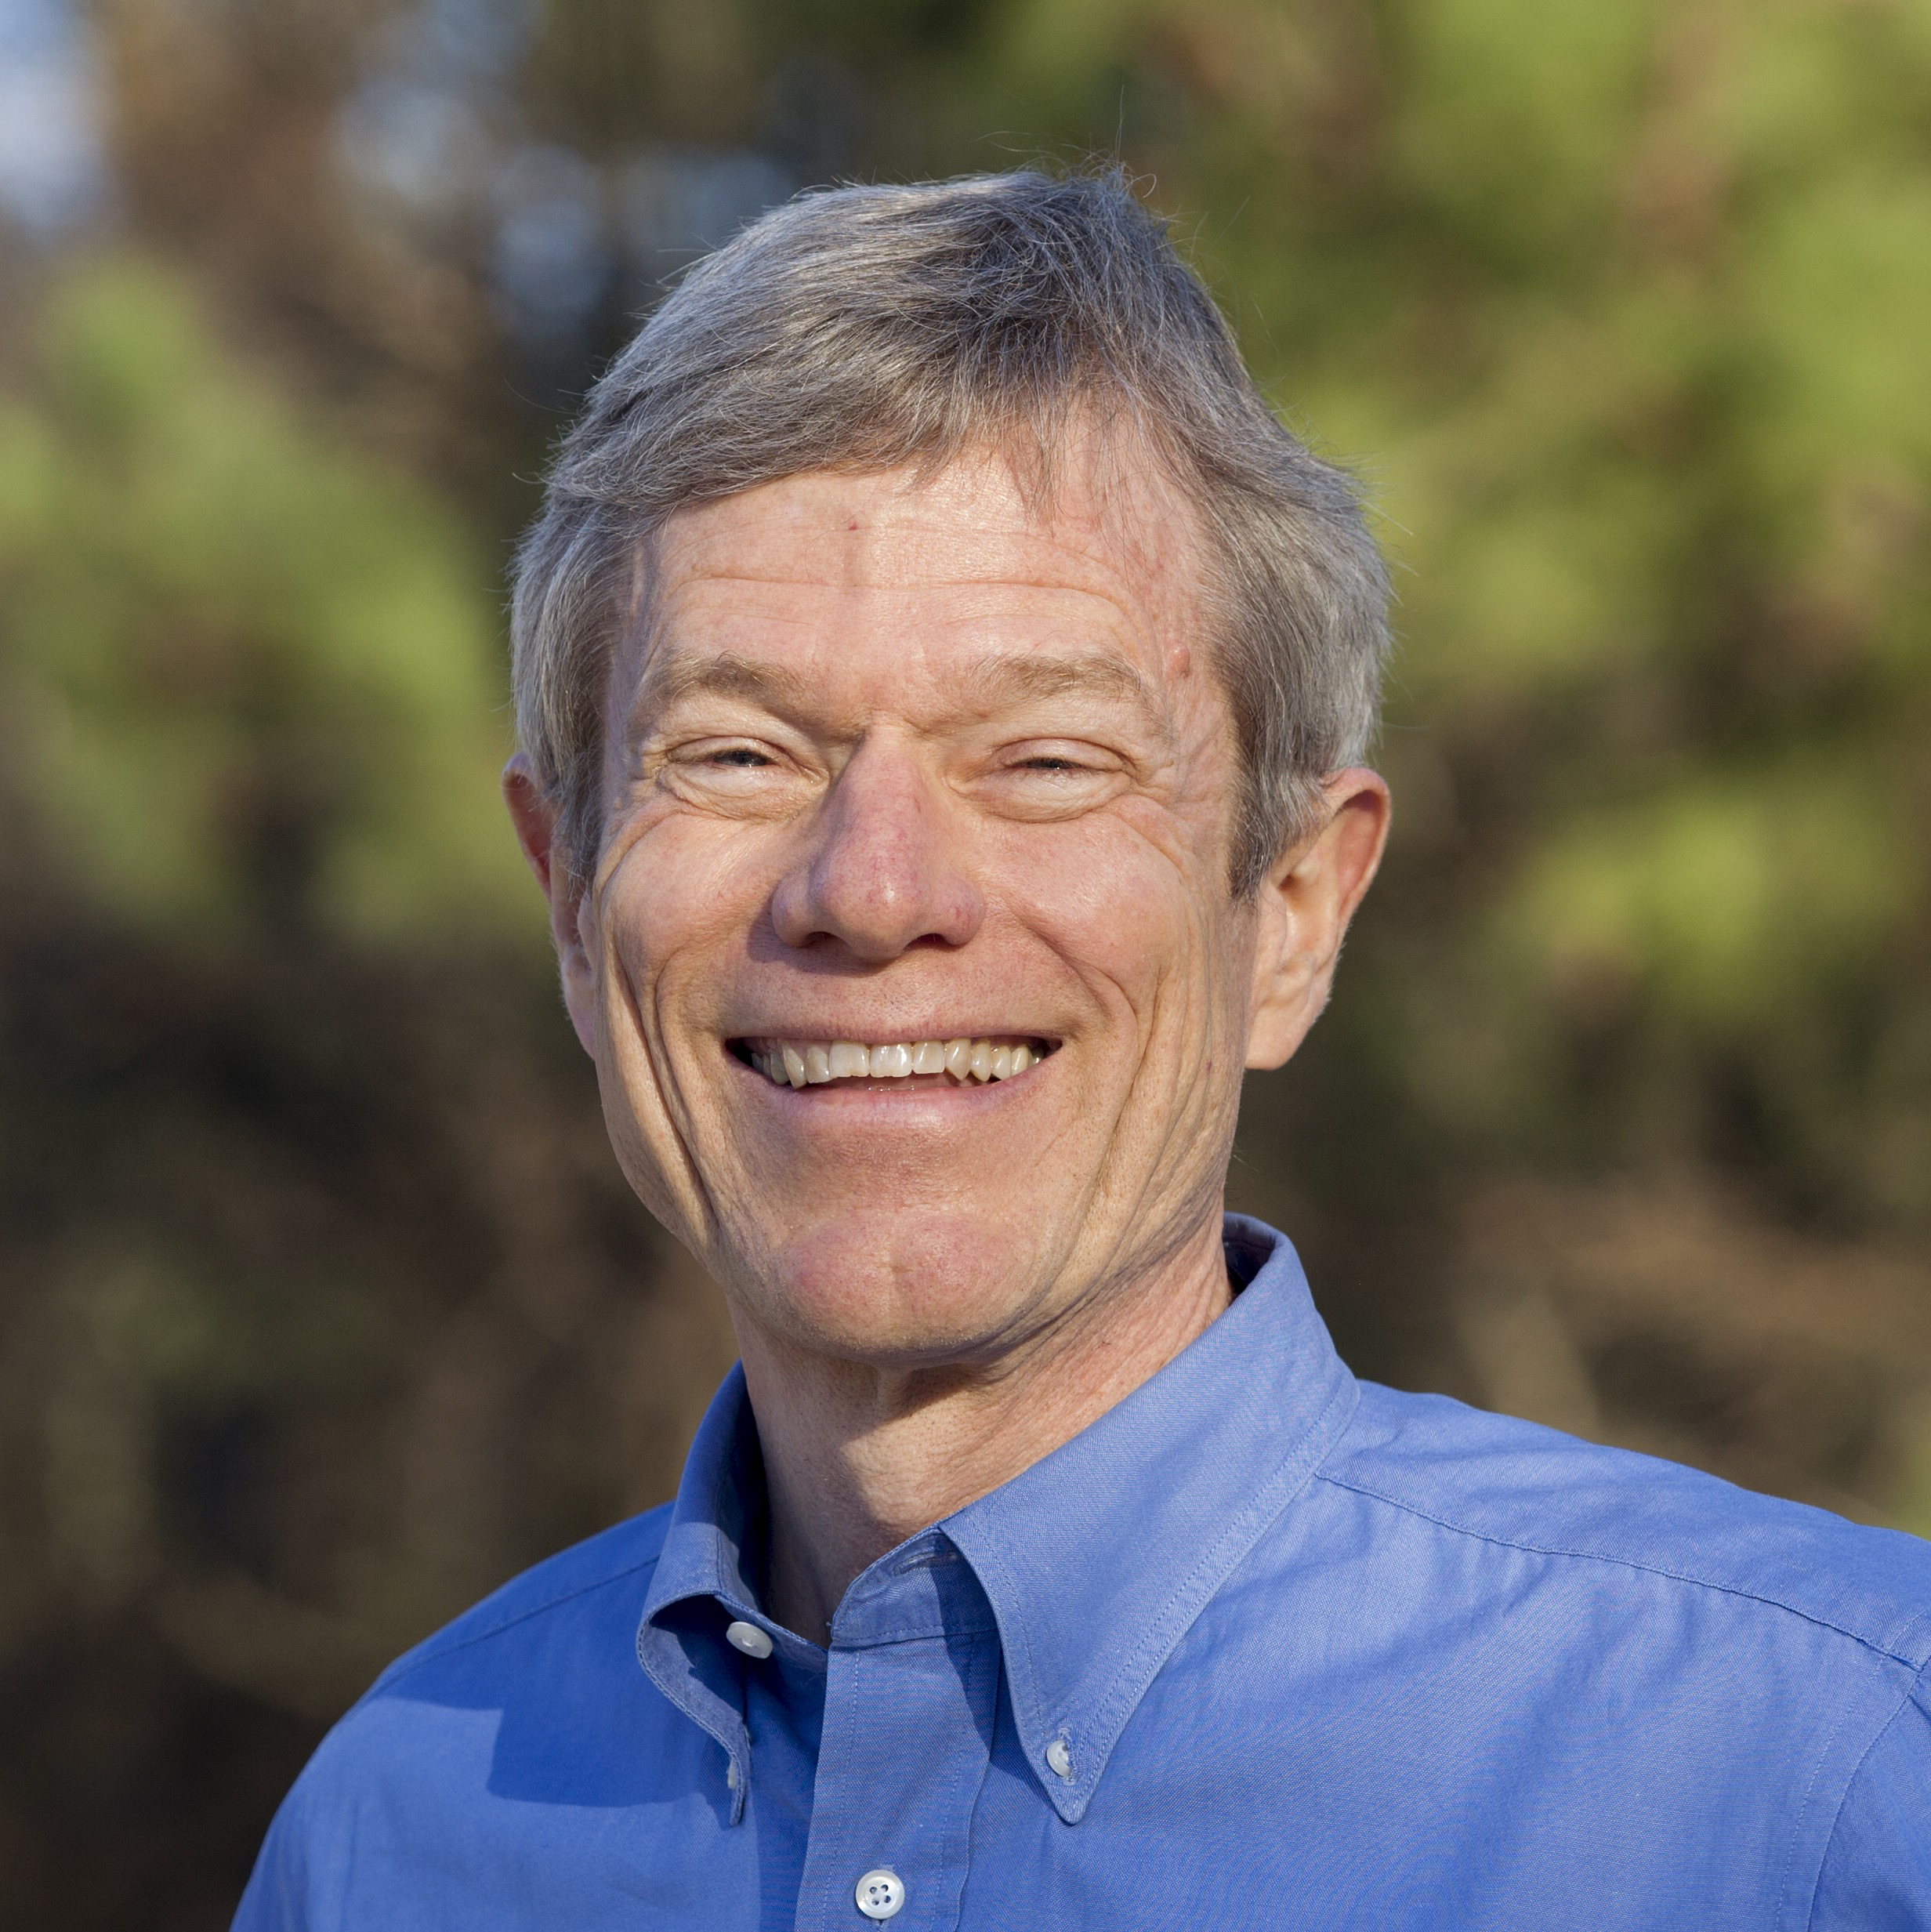 Dr. Larry Burk